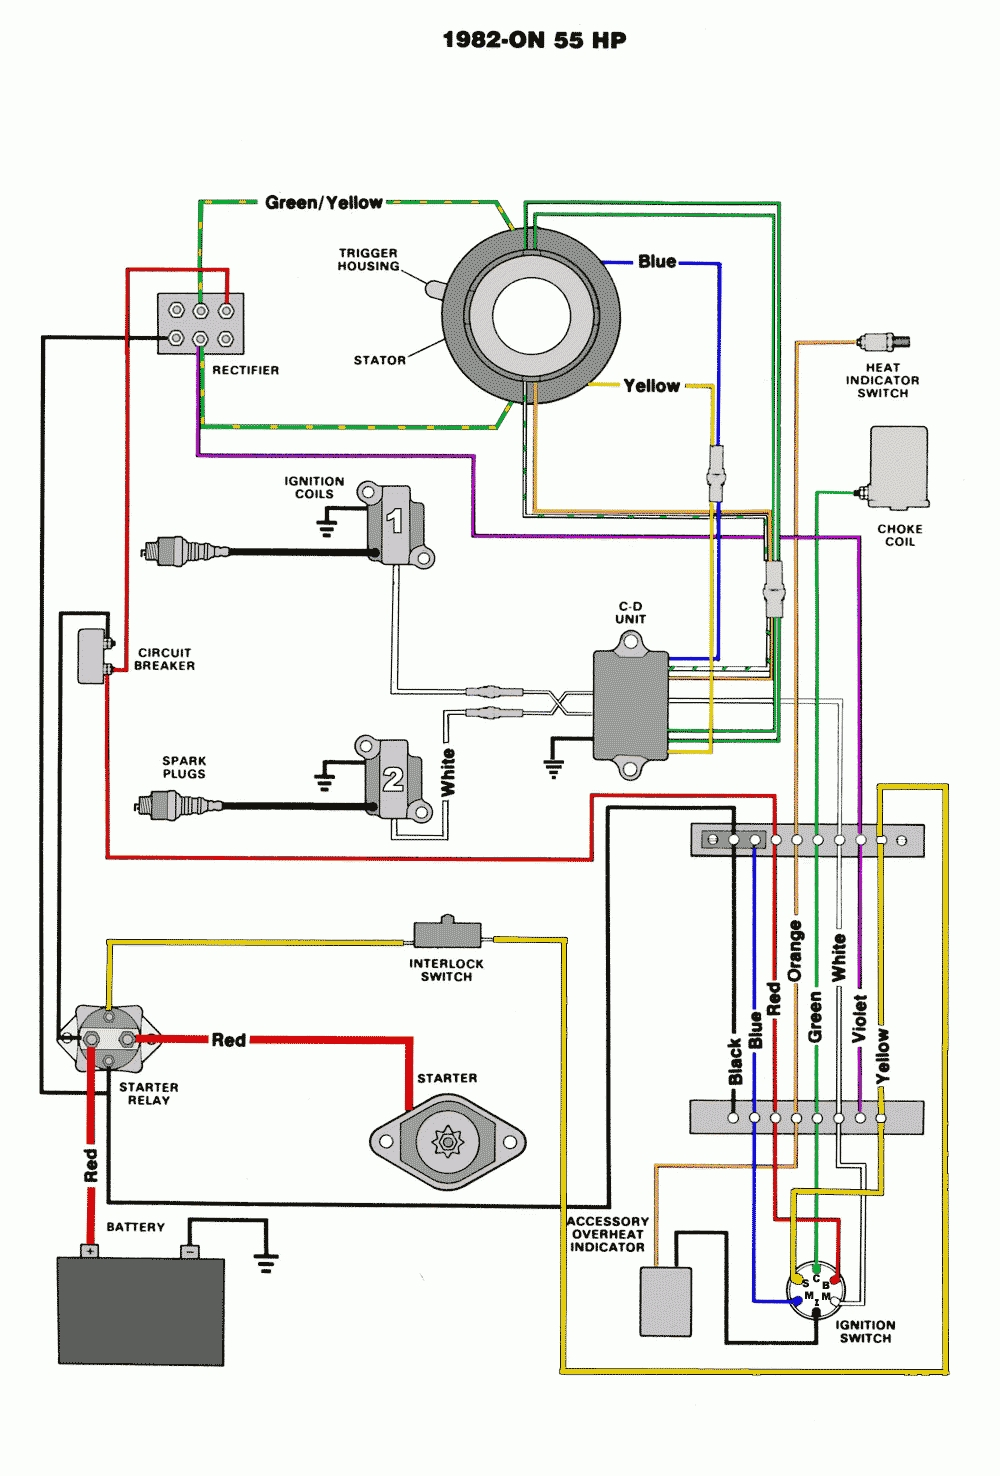 Diagram Mercury Force Wiring Diagrams Full Version Hd Quality Wiring Diagrams Labeldiagrams Corrierte It